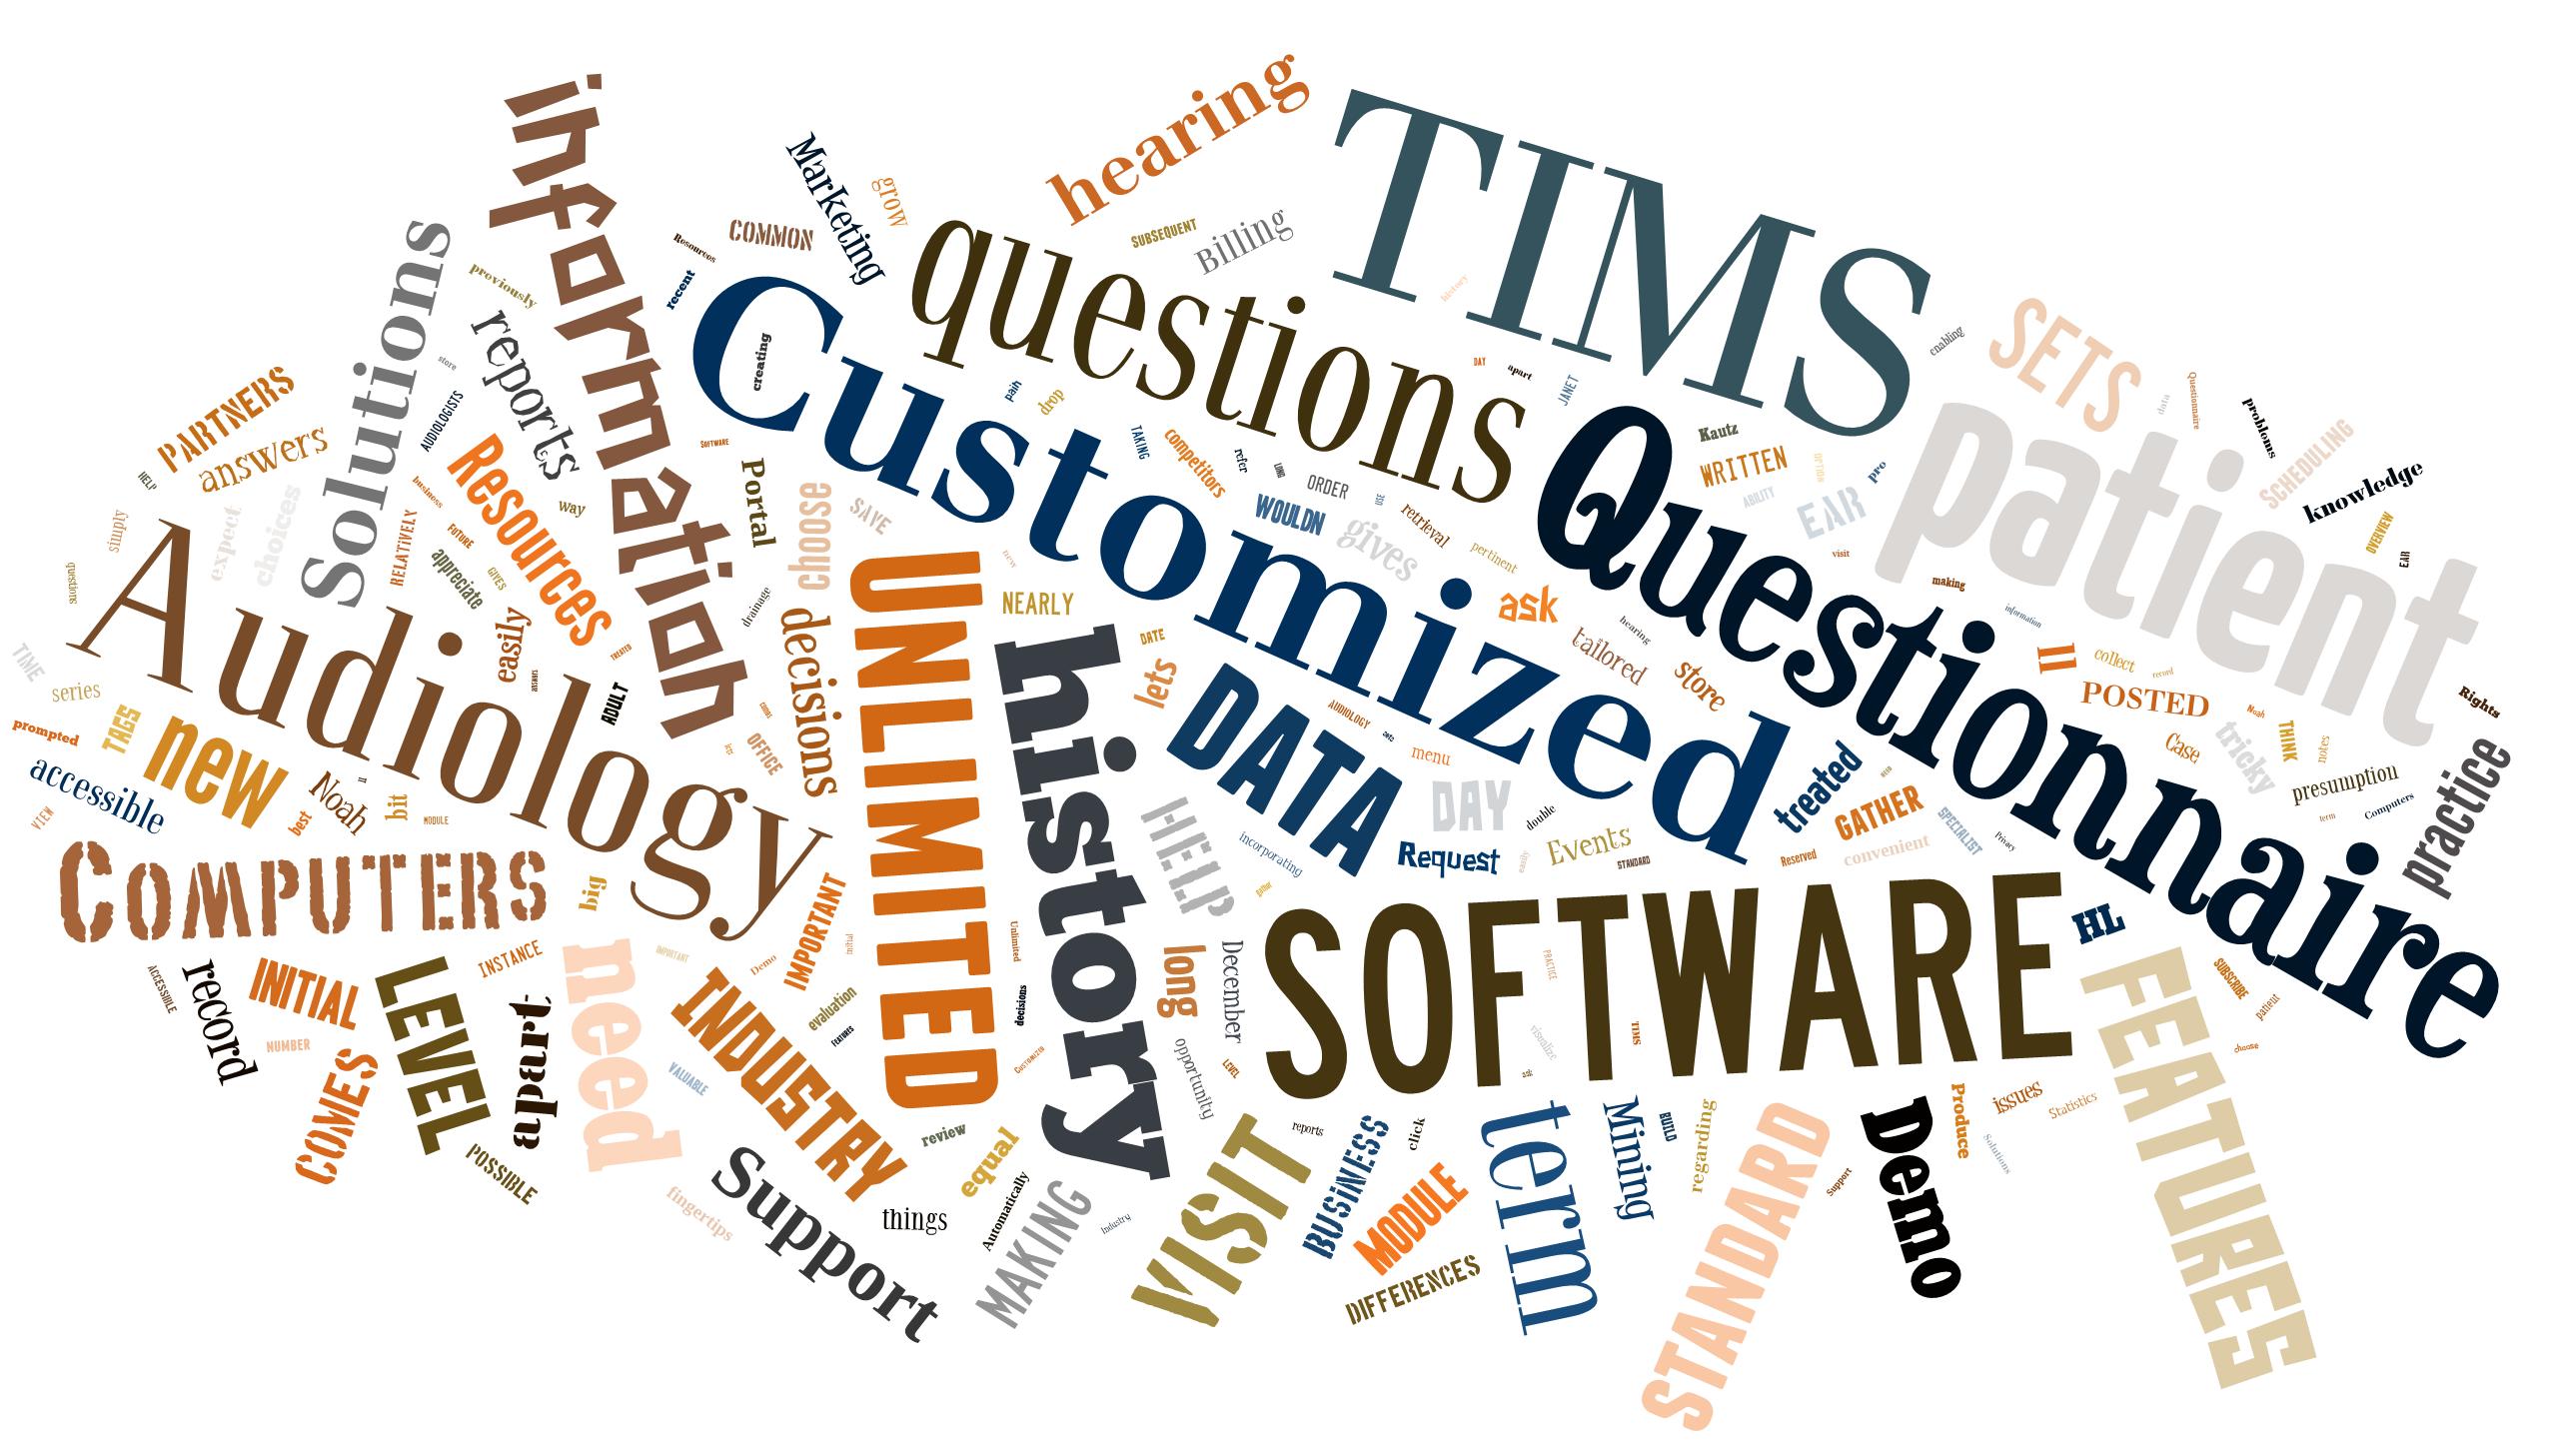 TIMSAudiologyquestionnaireTagCloudBlog